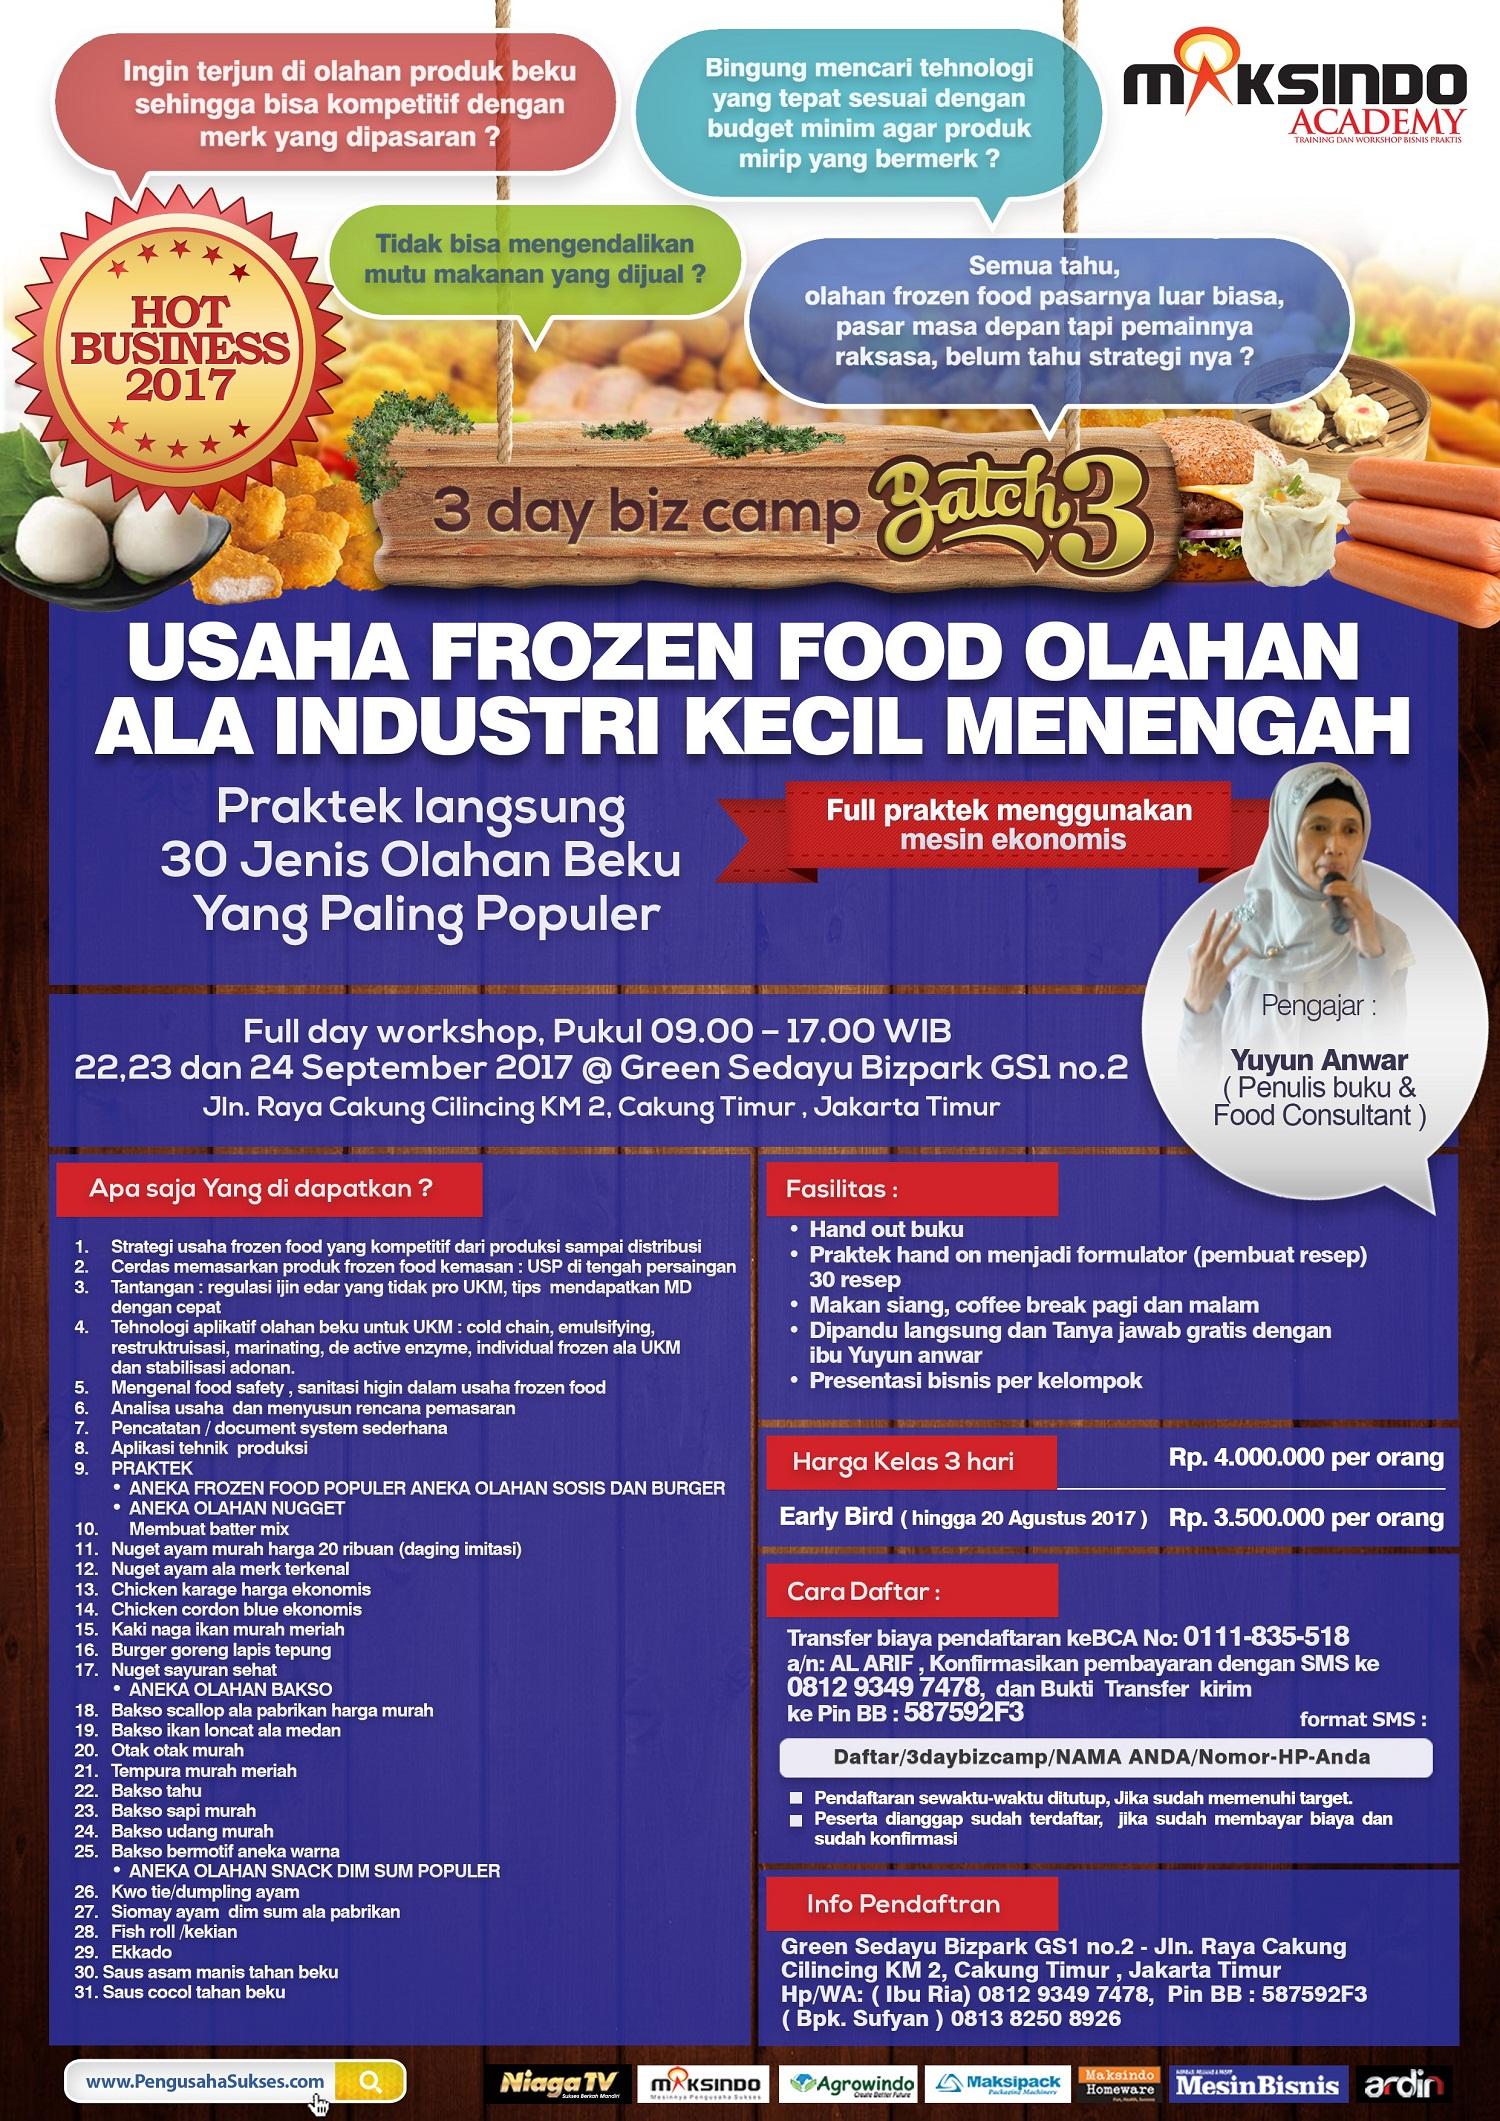 Training Usaha Frozen Food, 22-24 September 2017